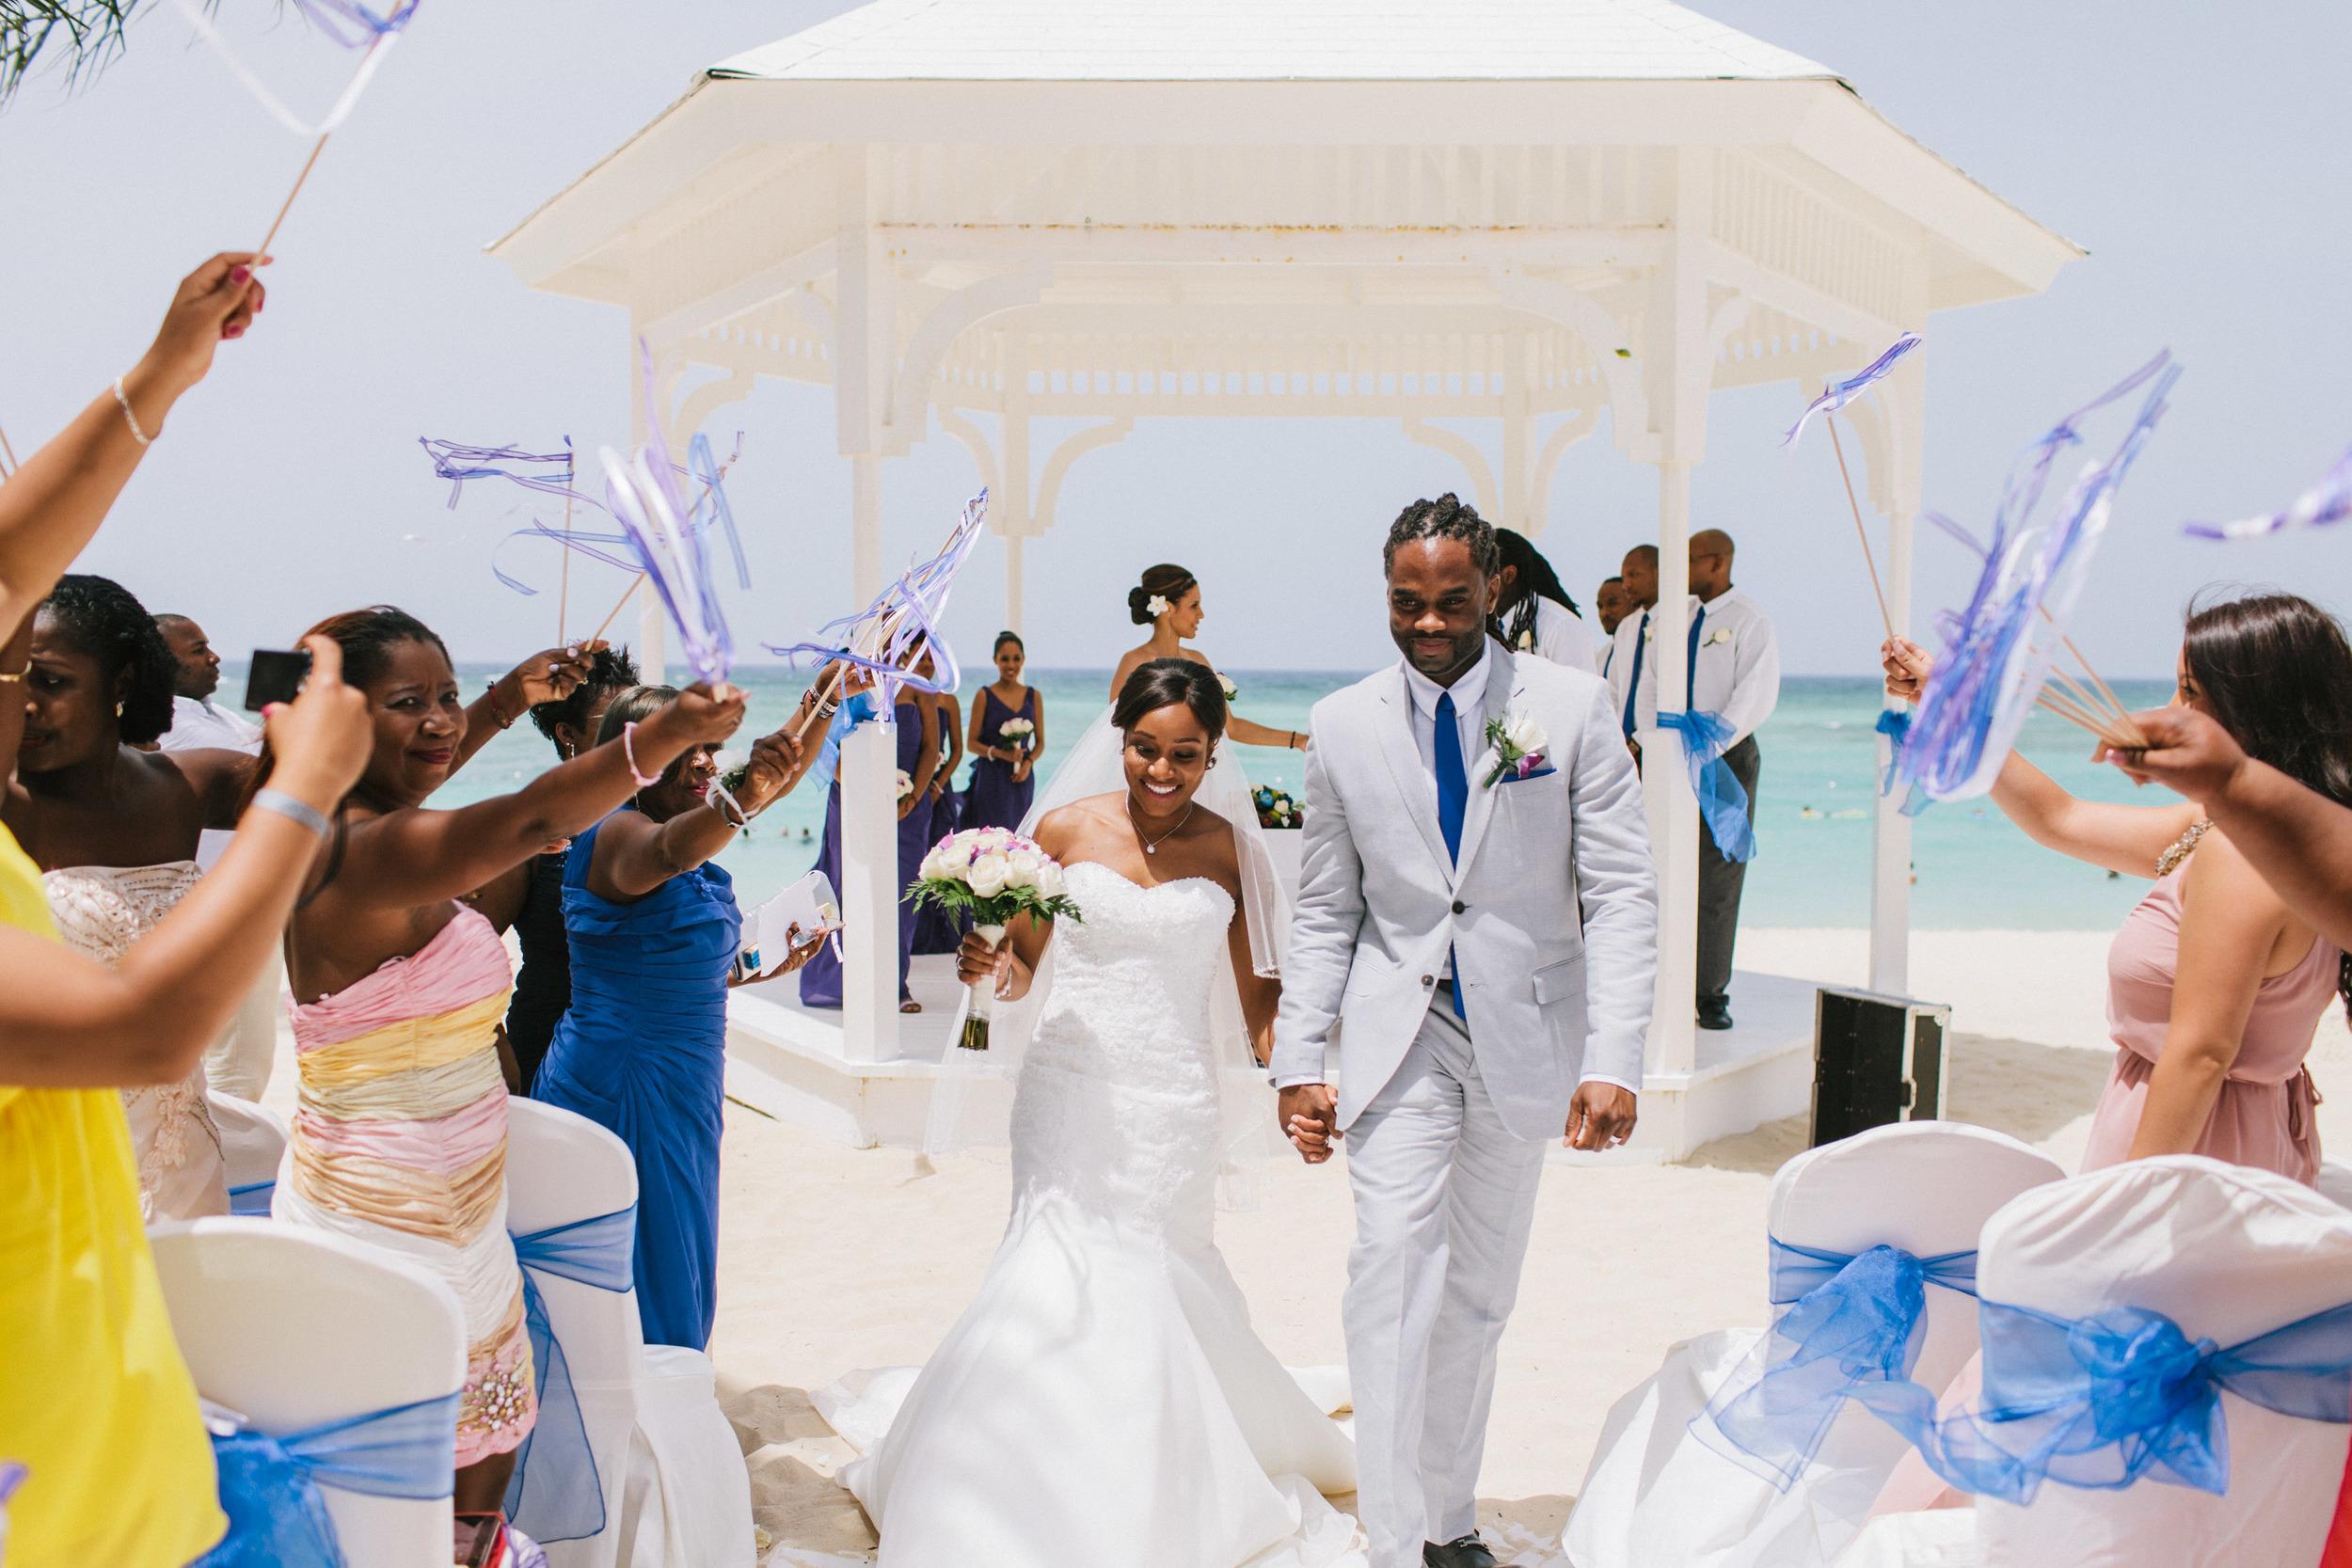 michael-rousseau-photography-dominican-republic-destination-wedding-cara-jason-colonial-majestic-dominican-republic081.jpg